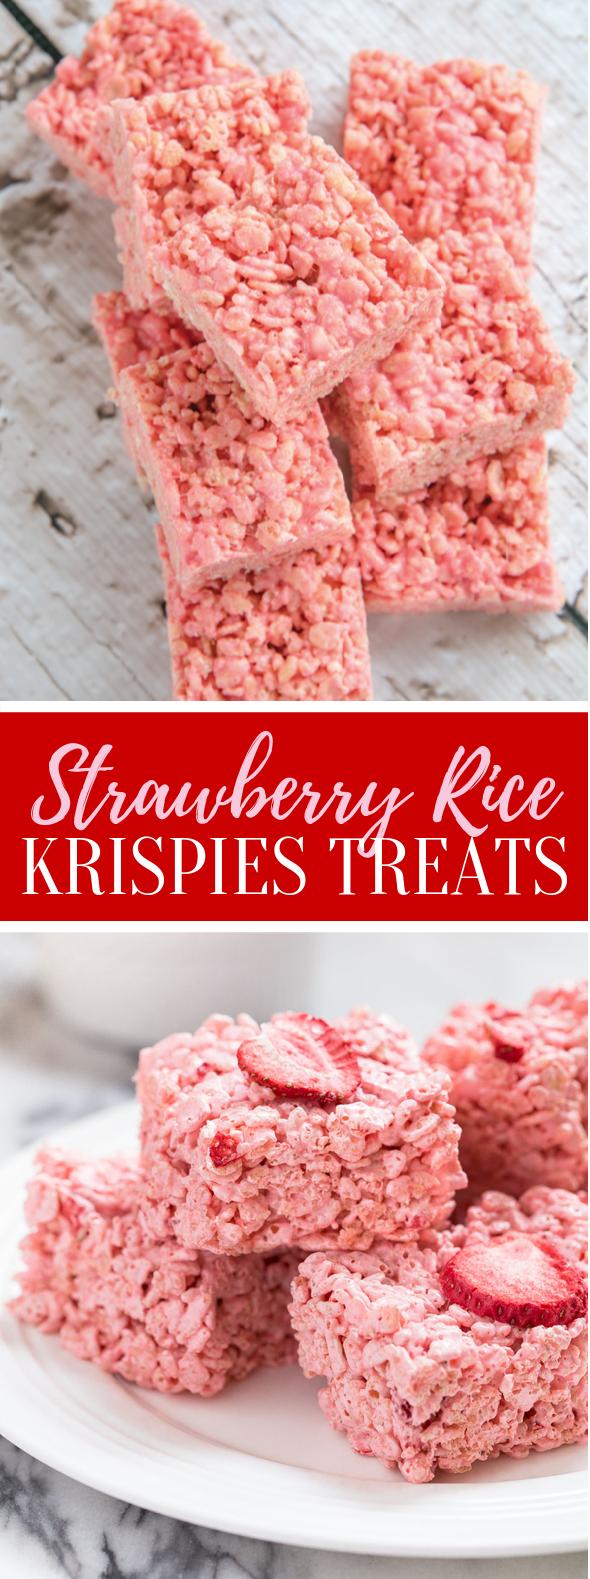 Strawberry Rice Krispie Treats #desserts #frozenrecipes #treats #strawberry #sweets